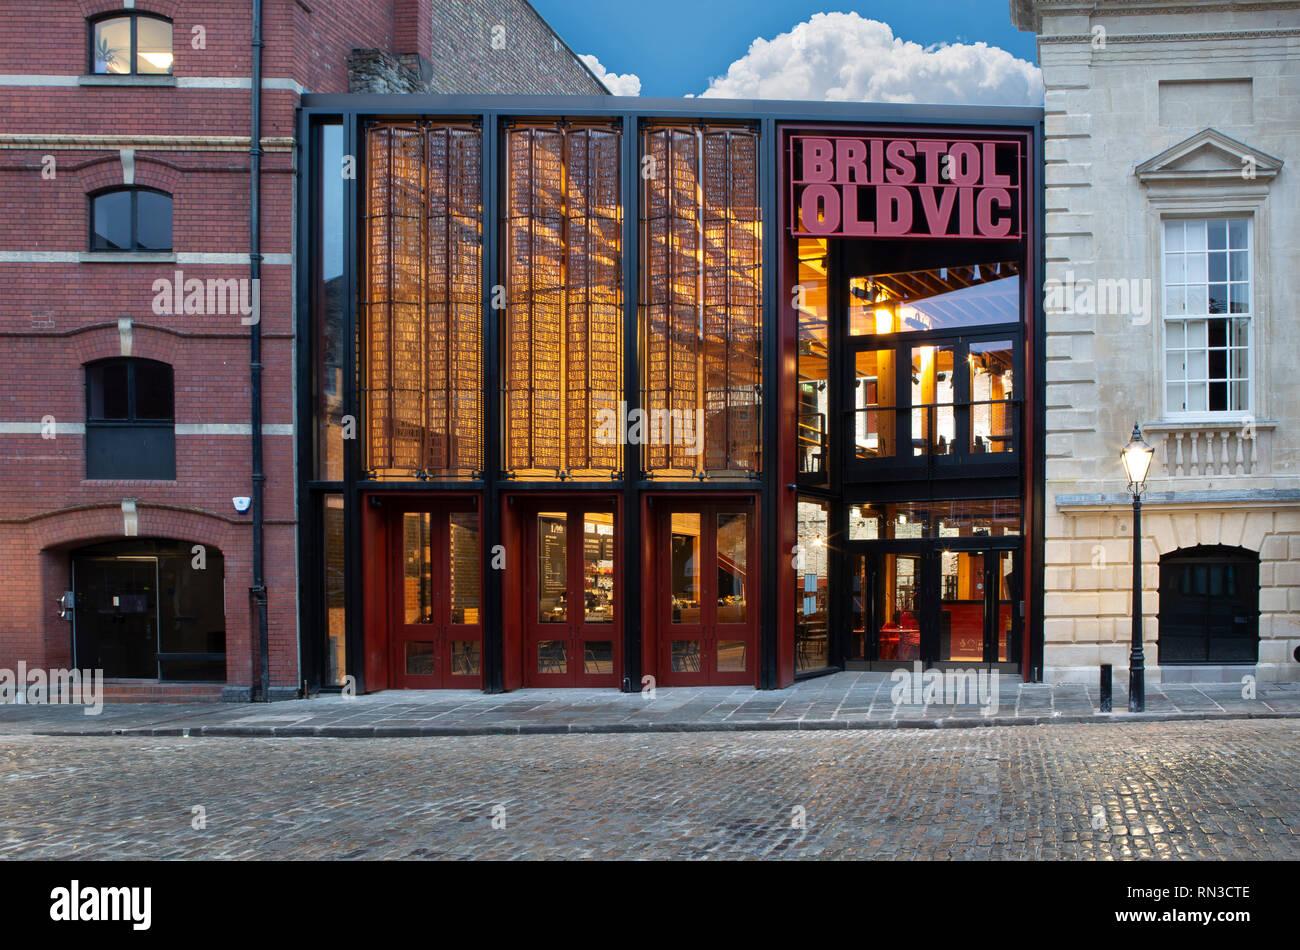 SWINDON, UK - FEBRUARY 16, 2019: The Bristol Old Vic Theatre King Street Bristol - Stock Image